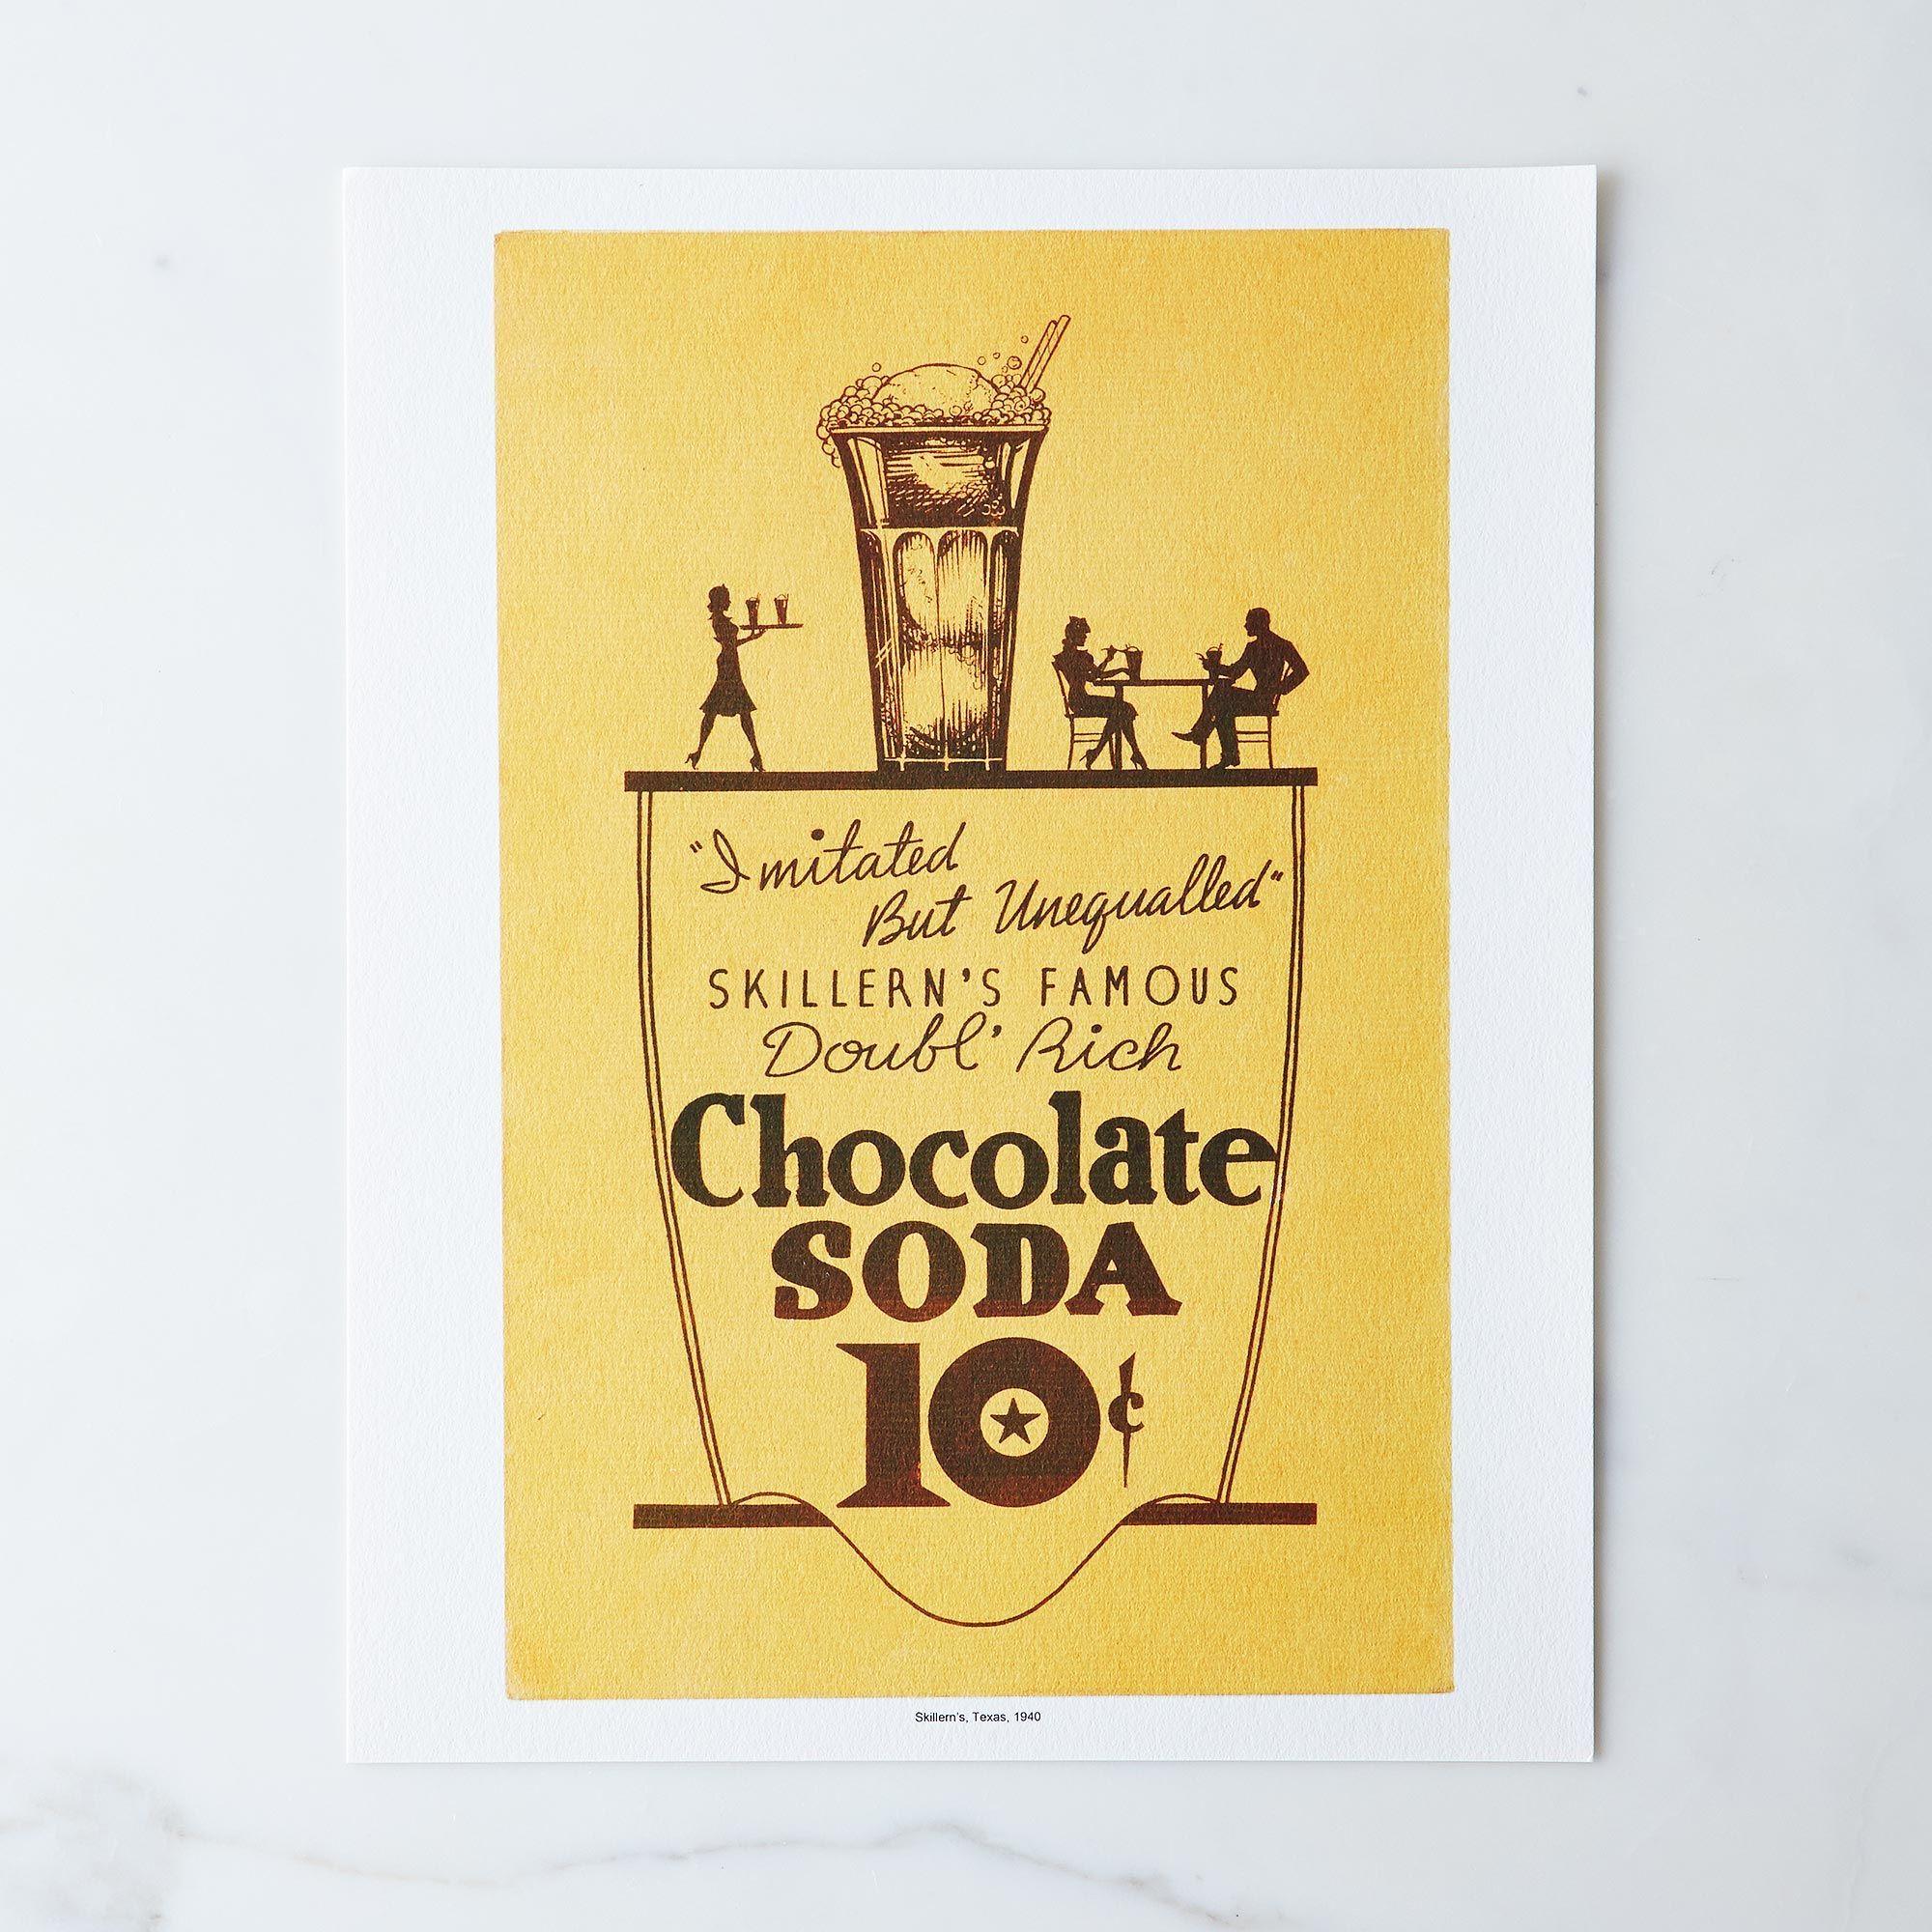 C2a702fe 181c 4b3e 9ec4 26f728de6bd2  2014 0421 cool culinaria skillerns chocolate print 009